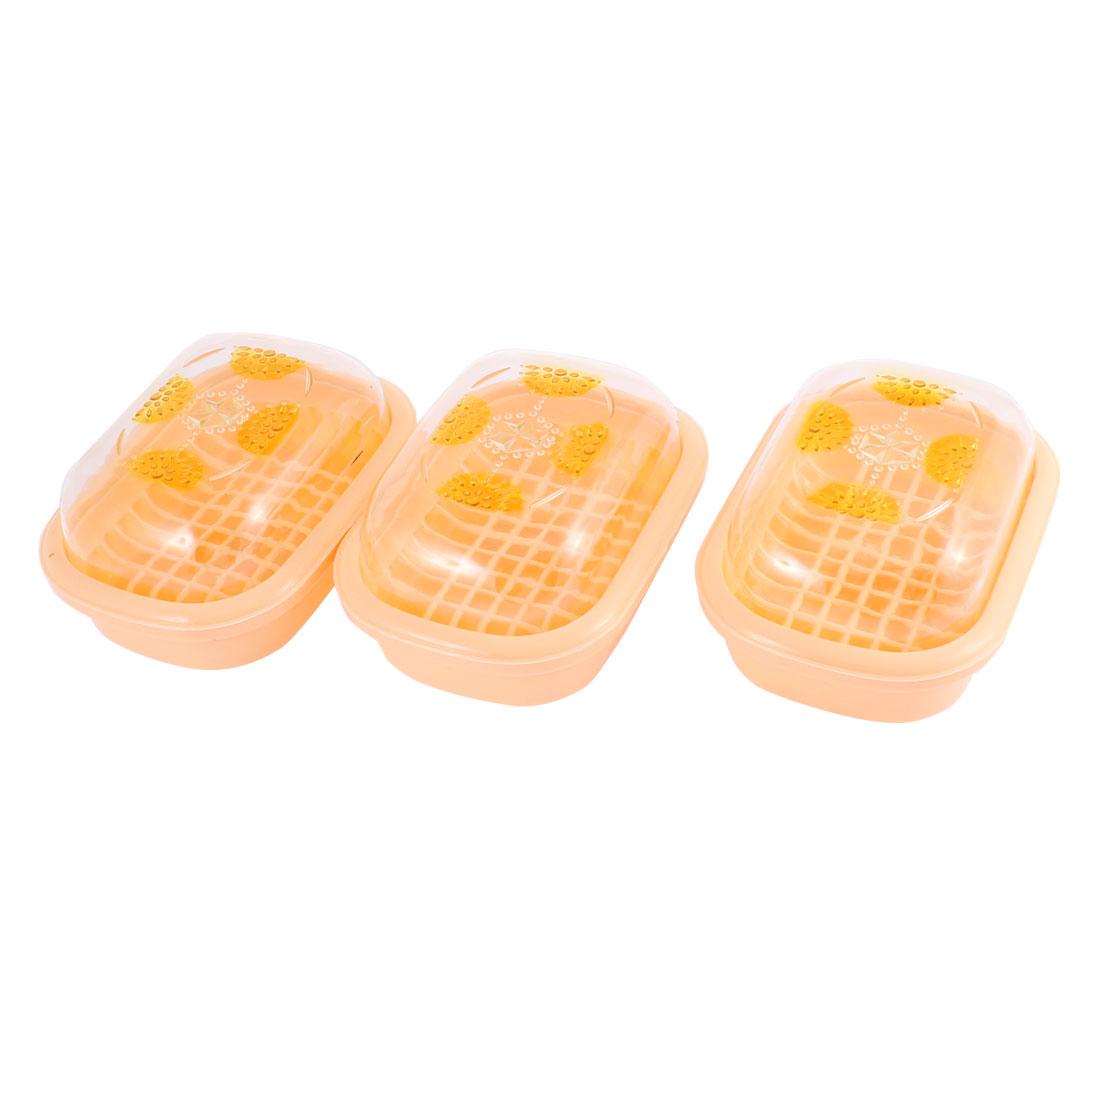 Bathroom Plastic Rhinestone Pattern Dual Layer Soap Dish Case Holder Orange 3pcs